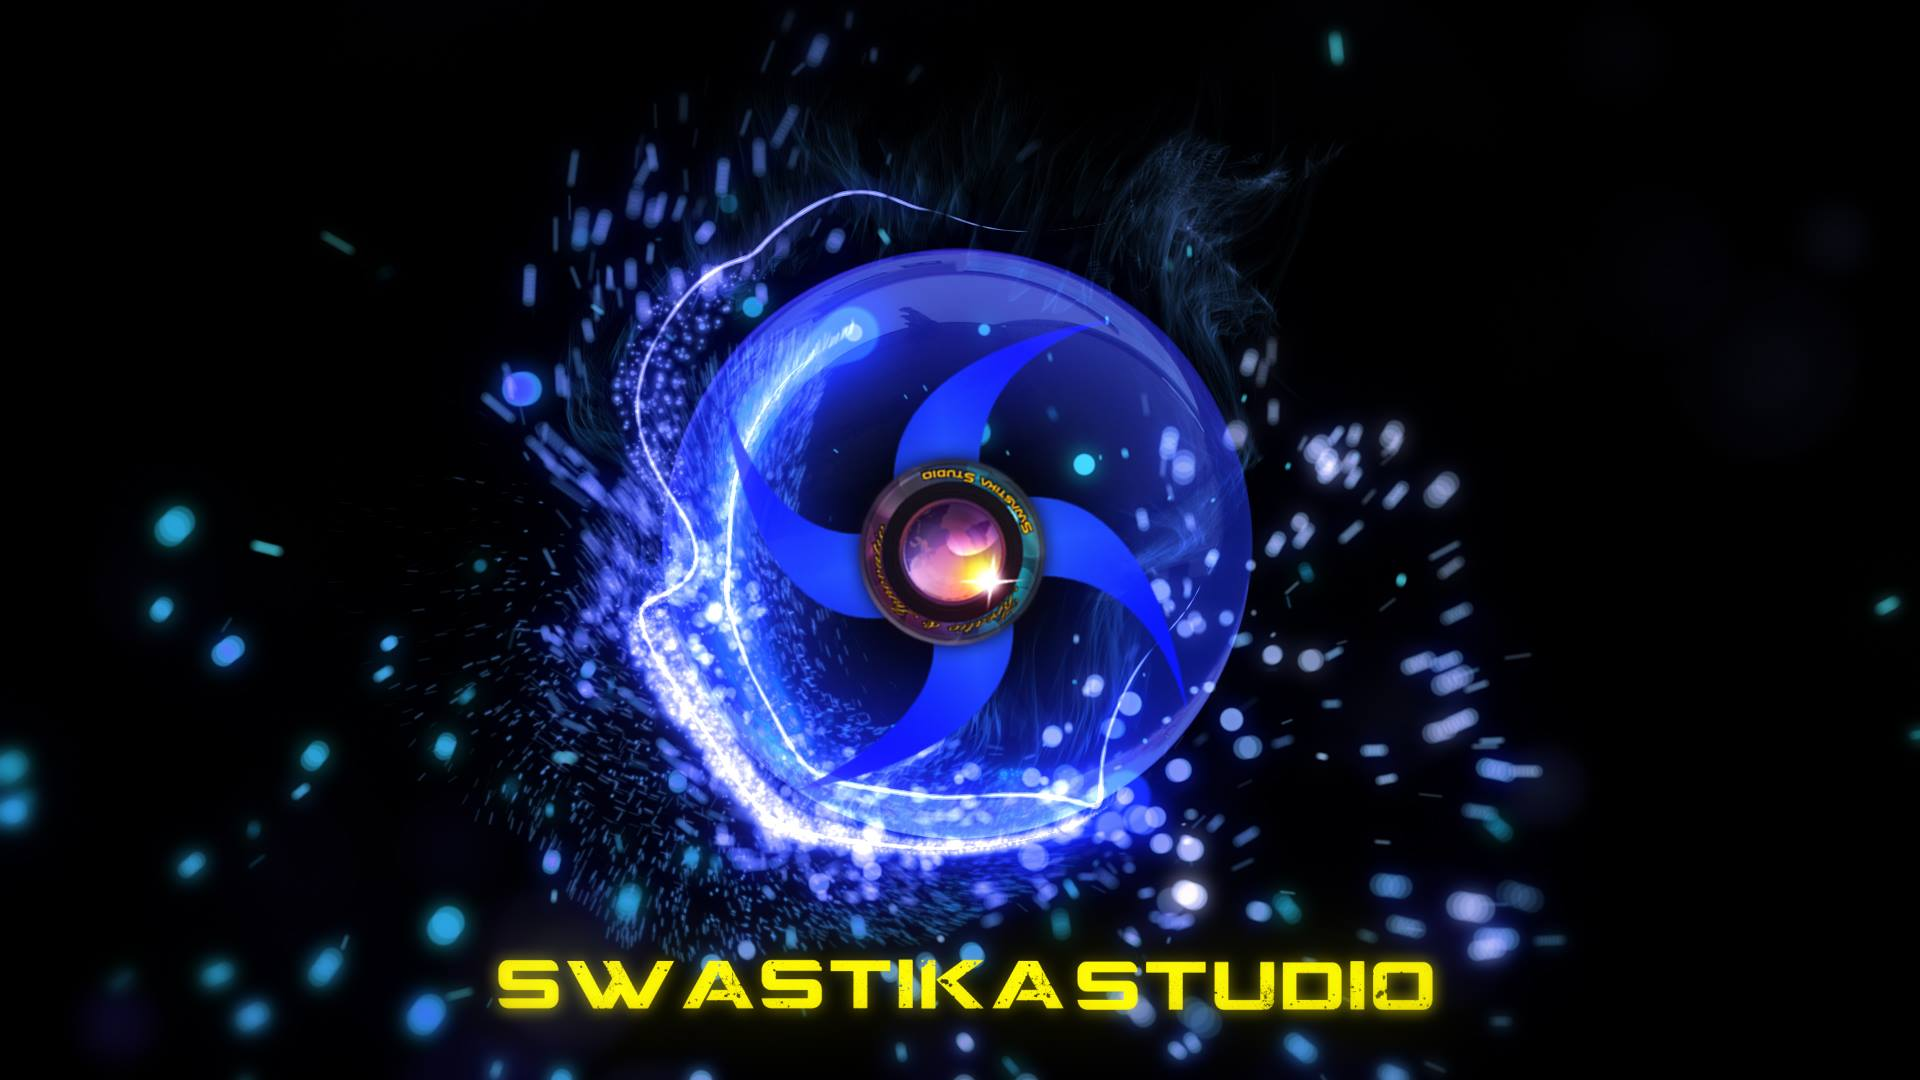 Swastika Studio